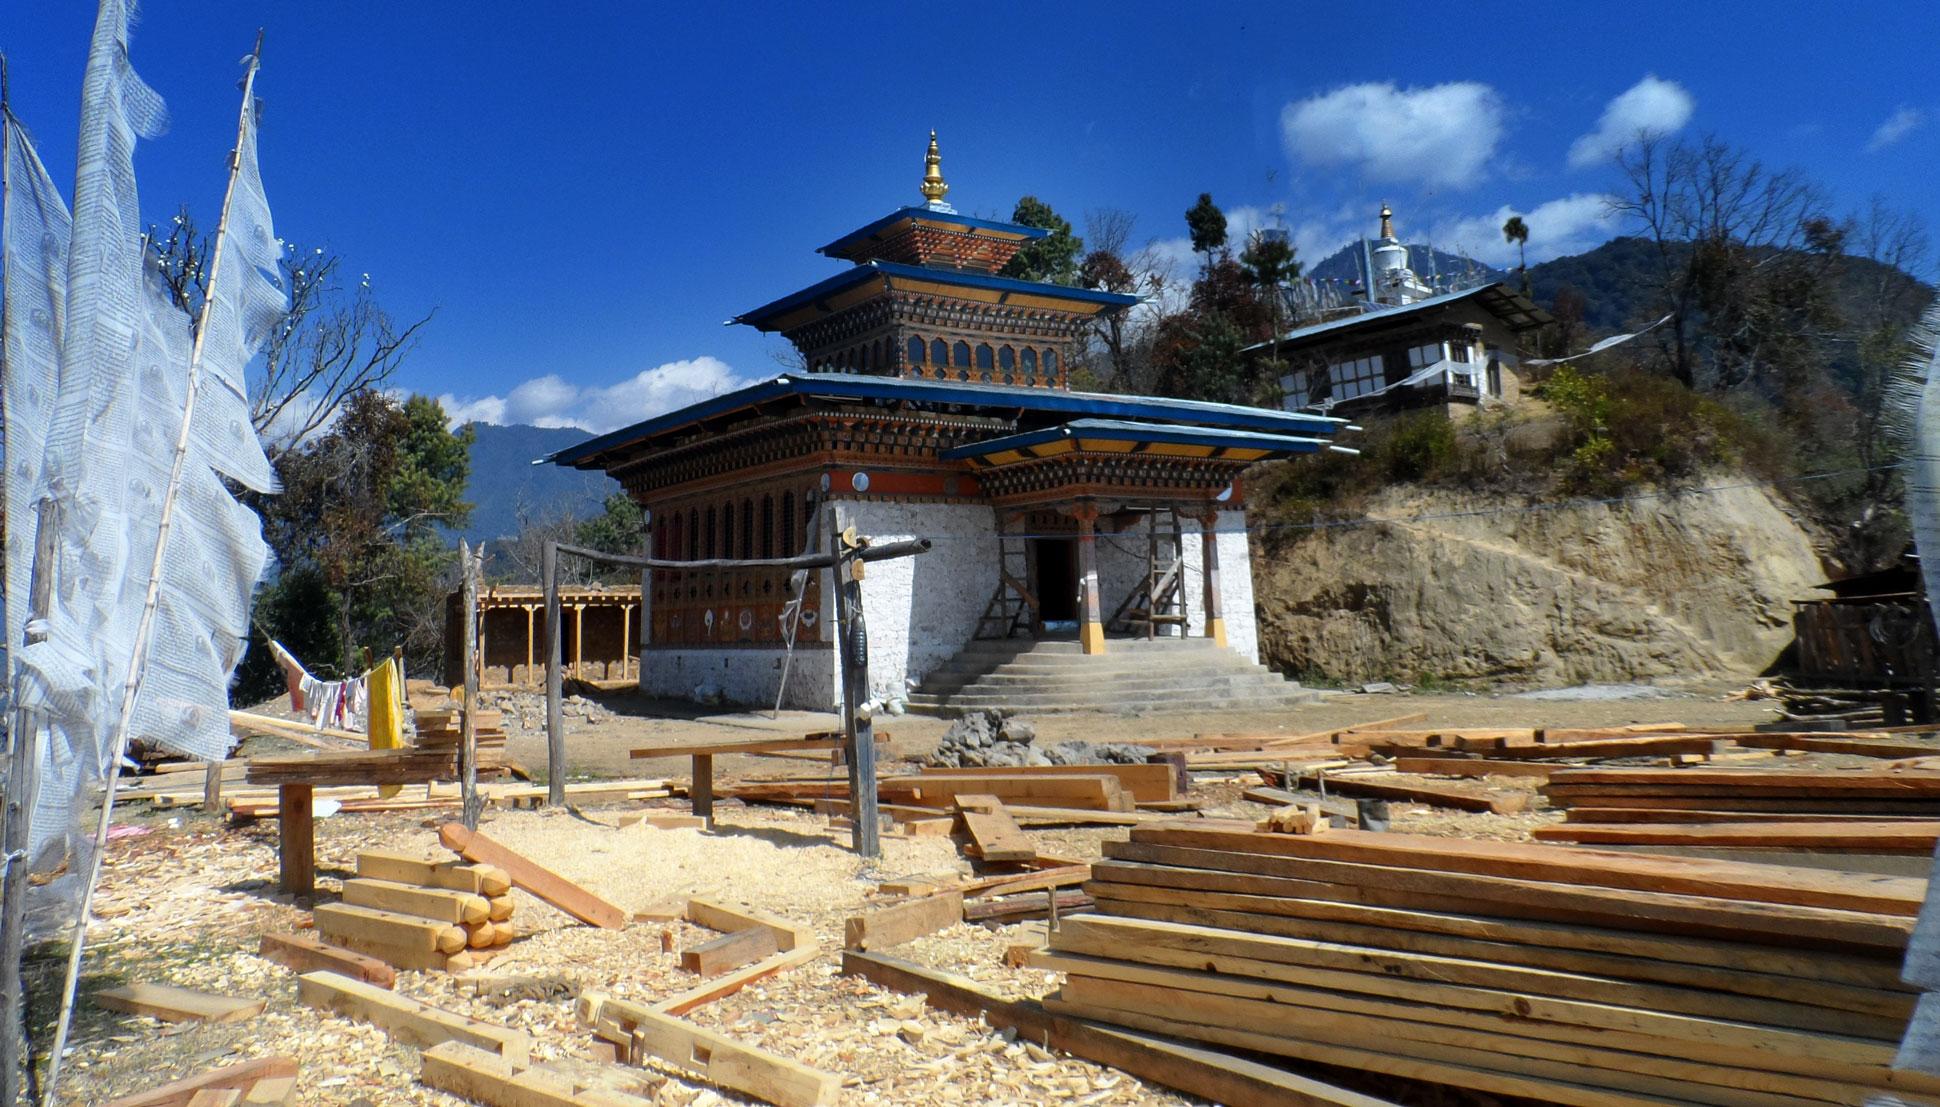 Sangay Choling Lhakhang